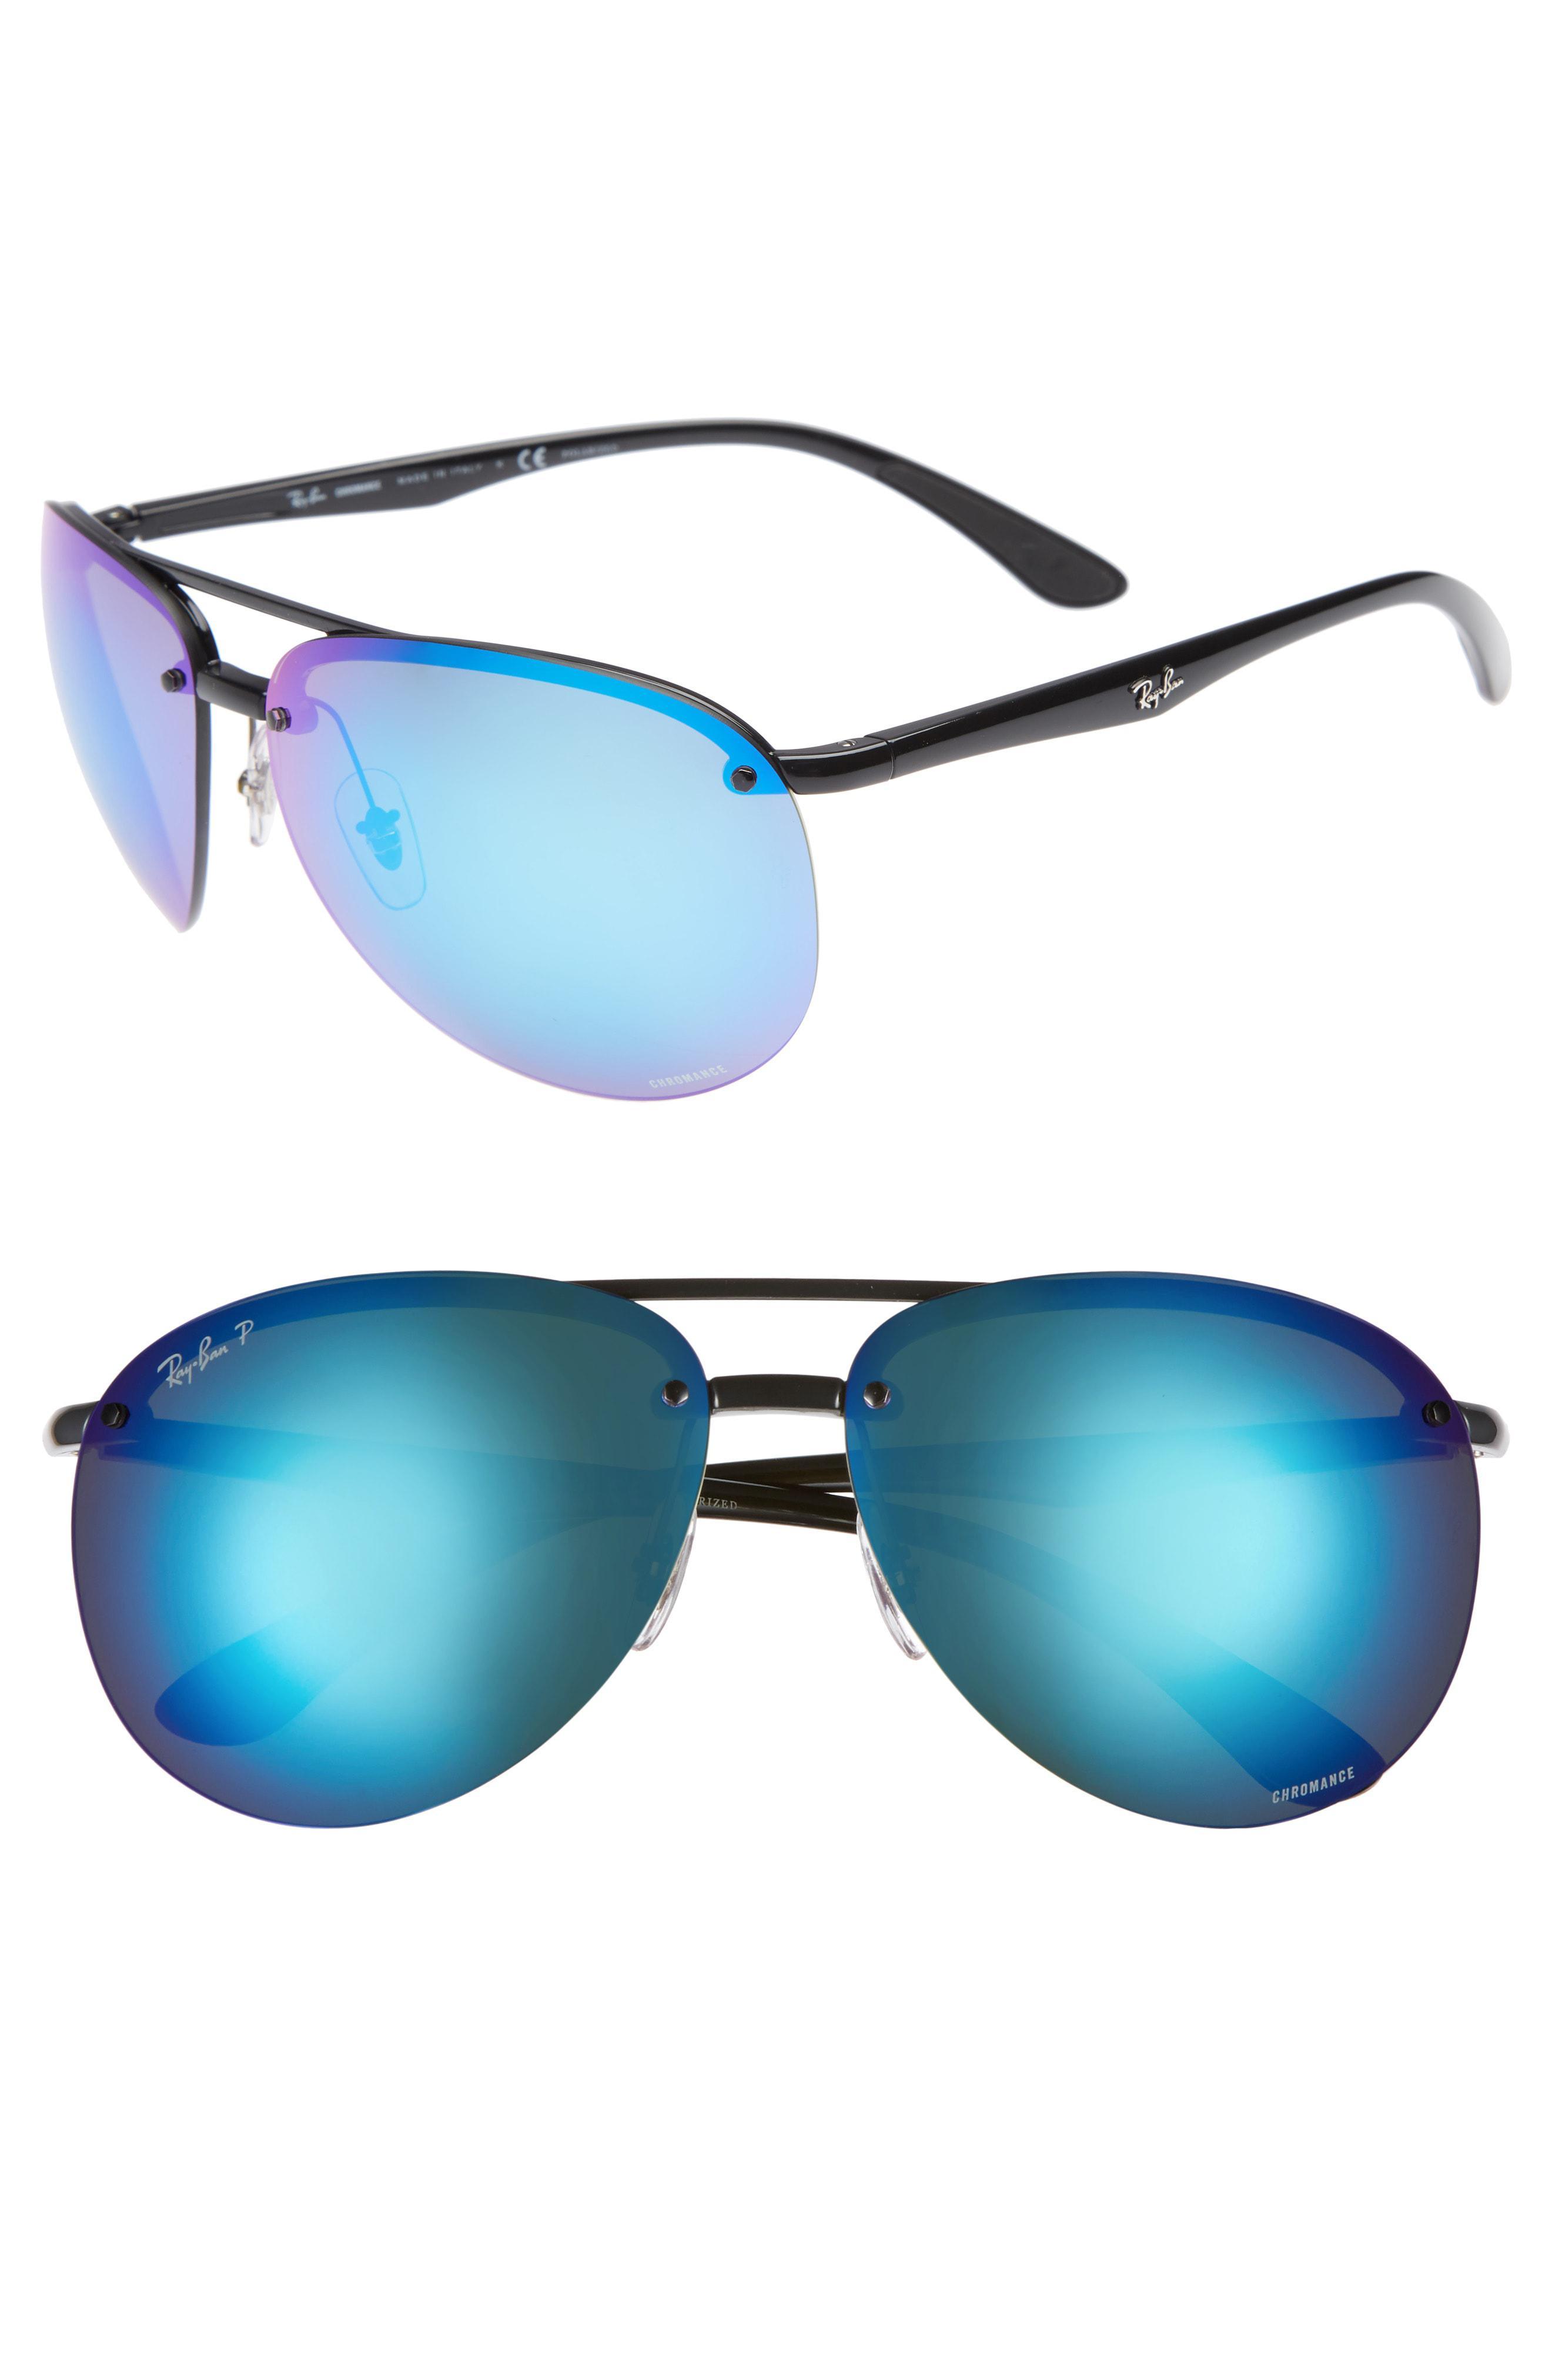 394986eaec Lyst - Ray-Ban 65mm Chromance Polarized Aviator Sunglasses in Black ...